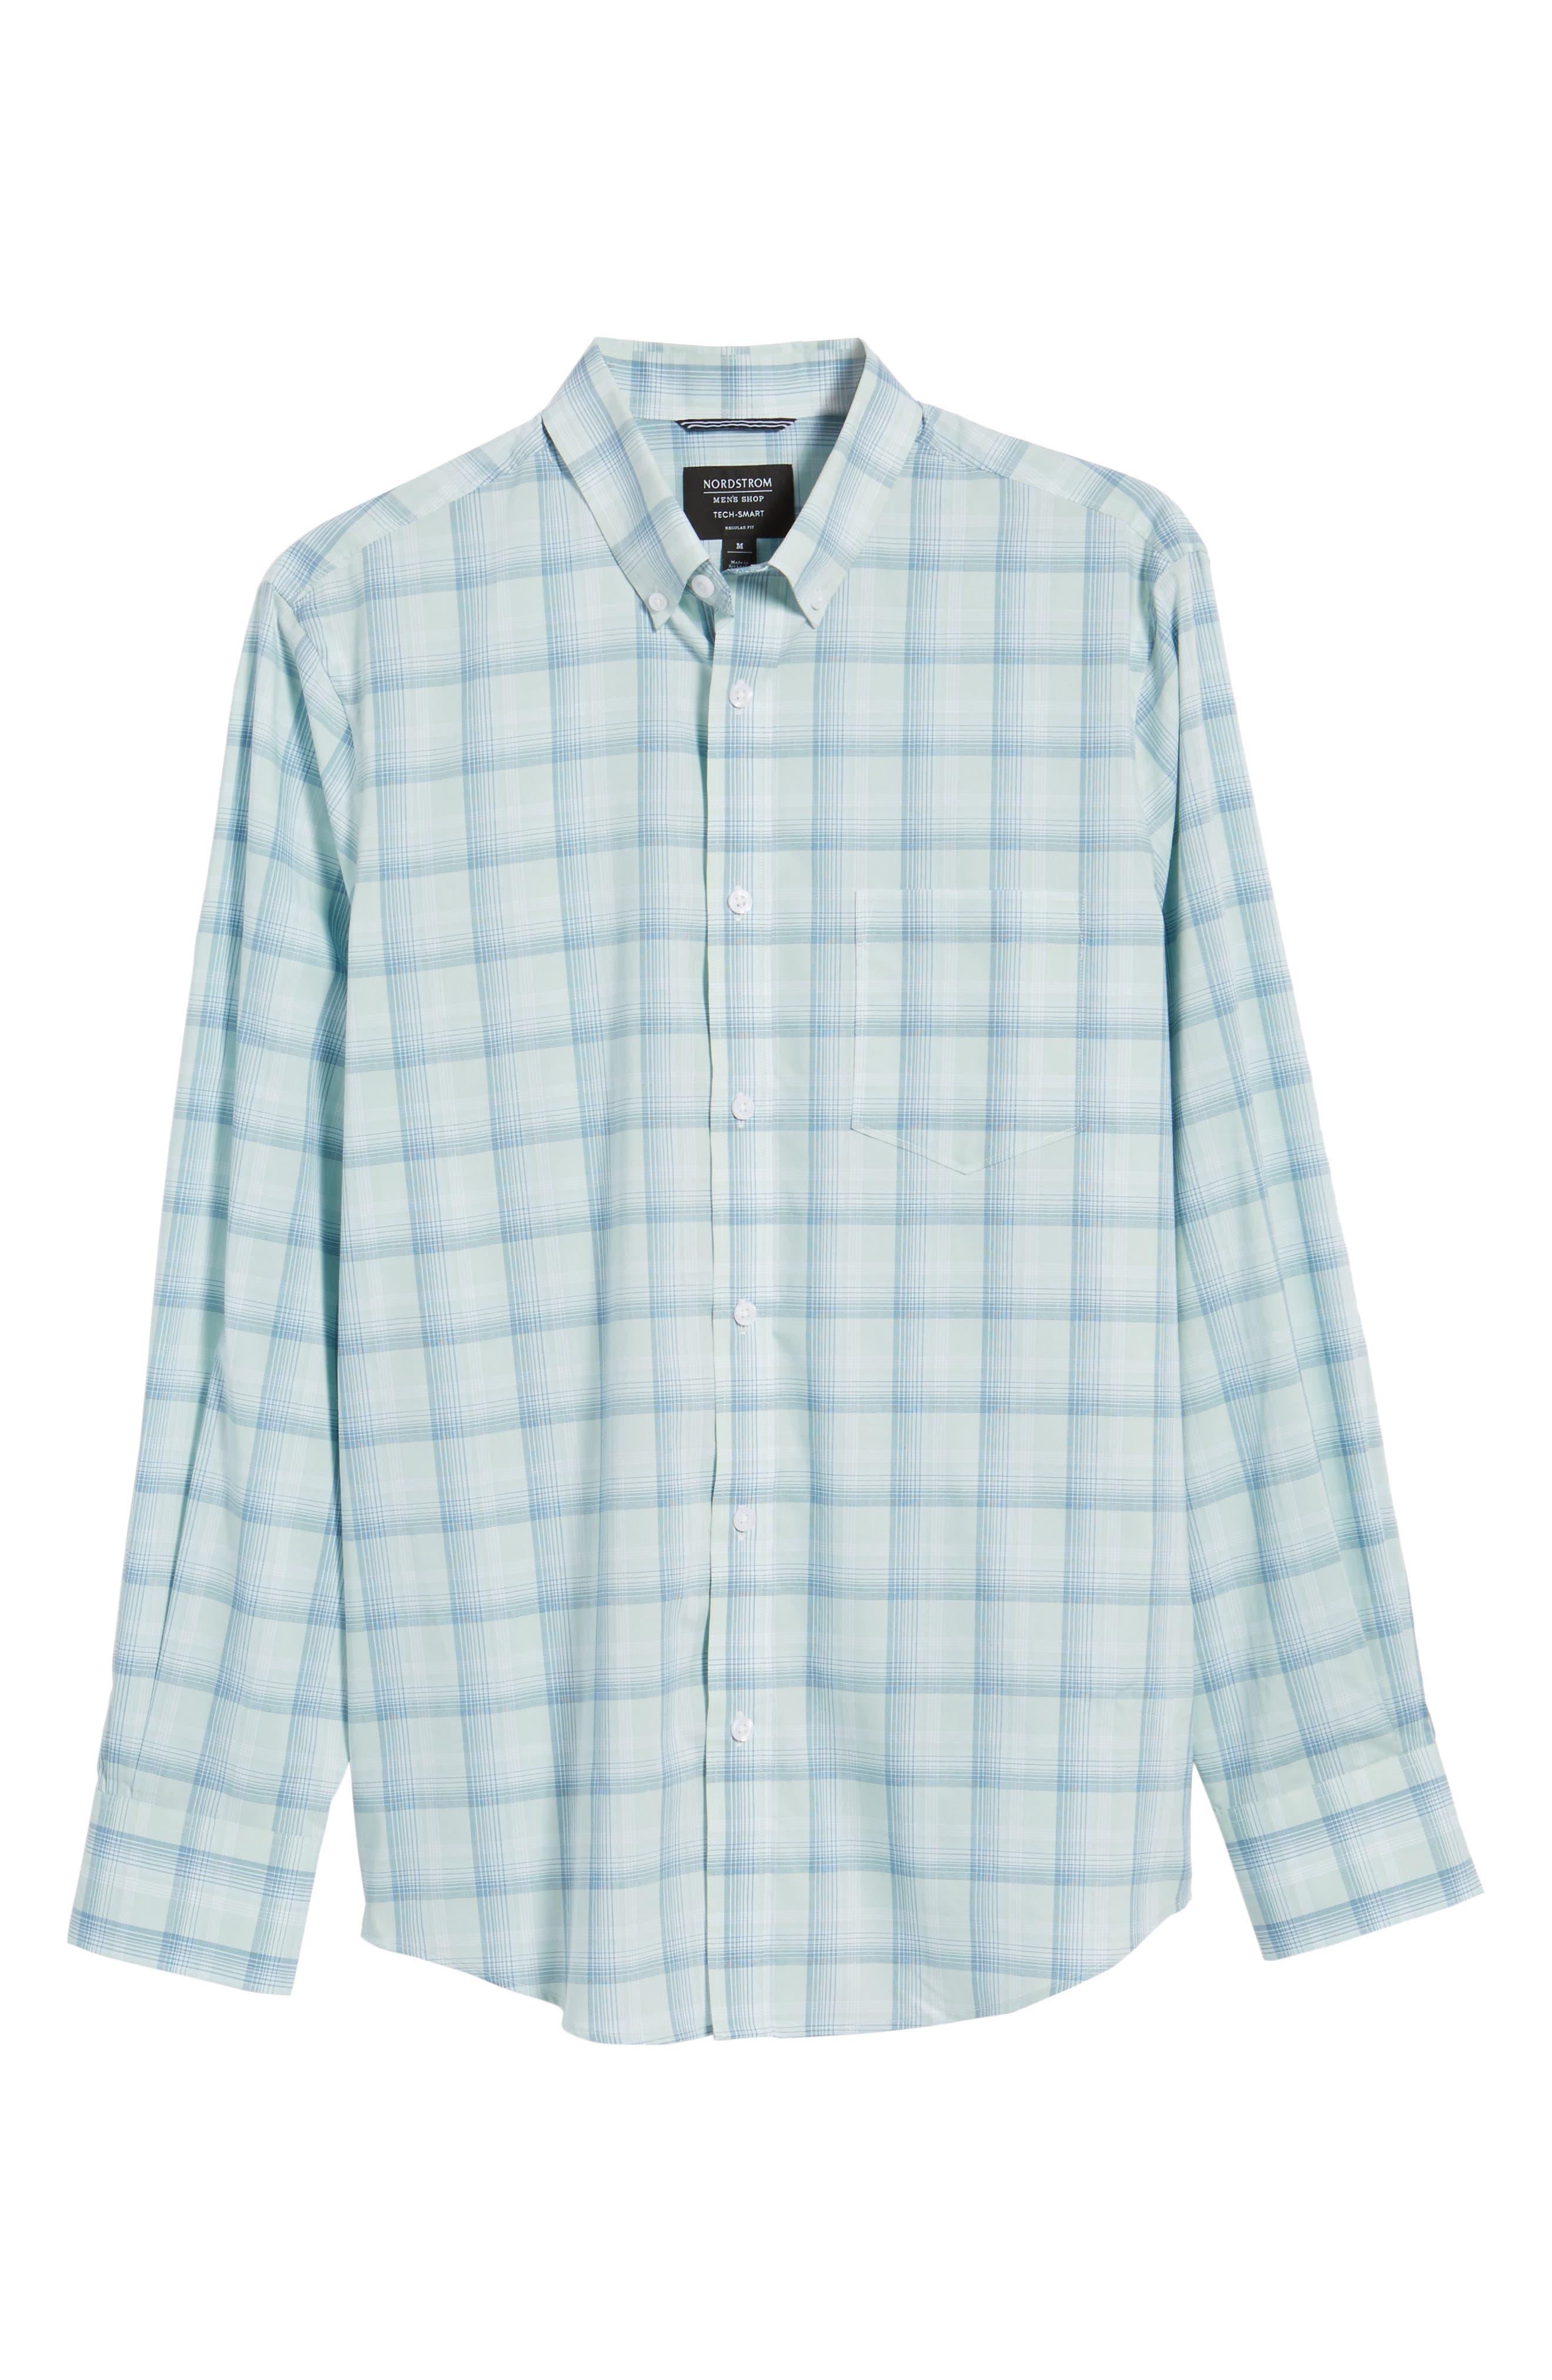 Tech-Smart Regular Fit Plaid Sport Shirt,                             Alternate thumbnail 6, color,                             Teal Surf Blue Plaid